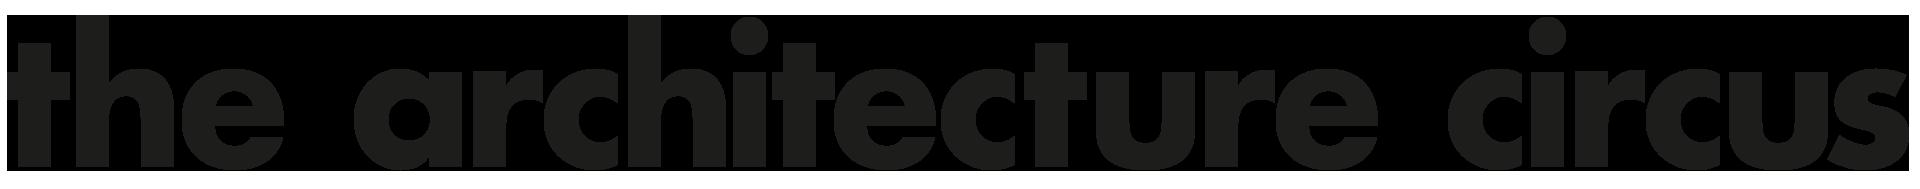 Logo text transpa